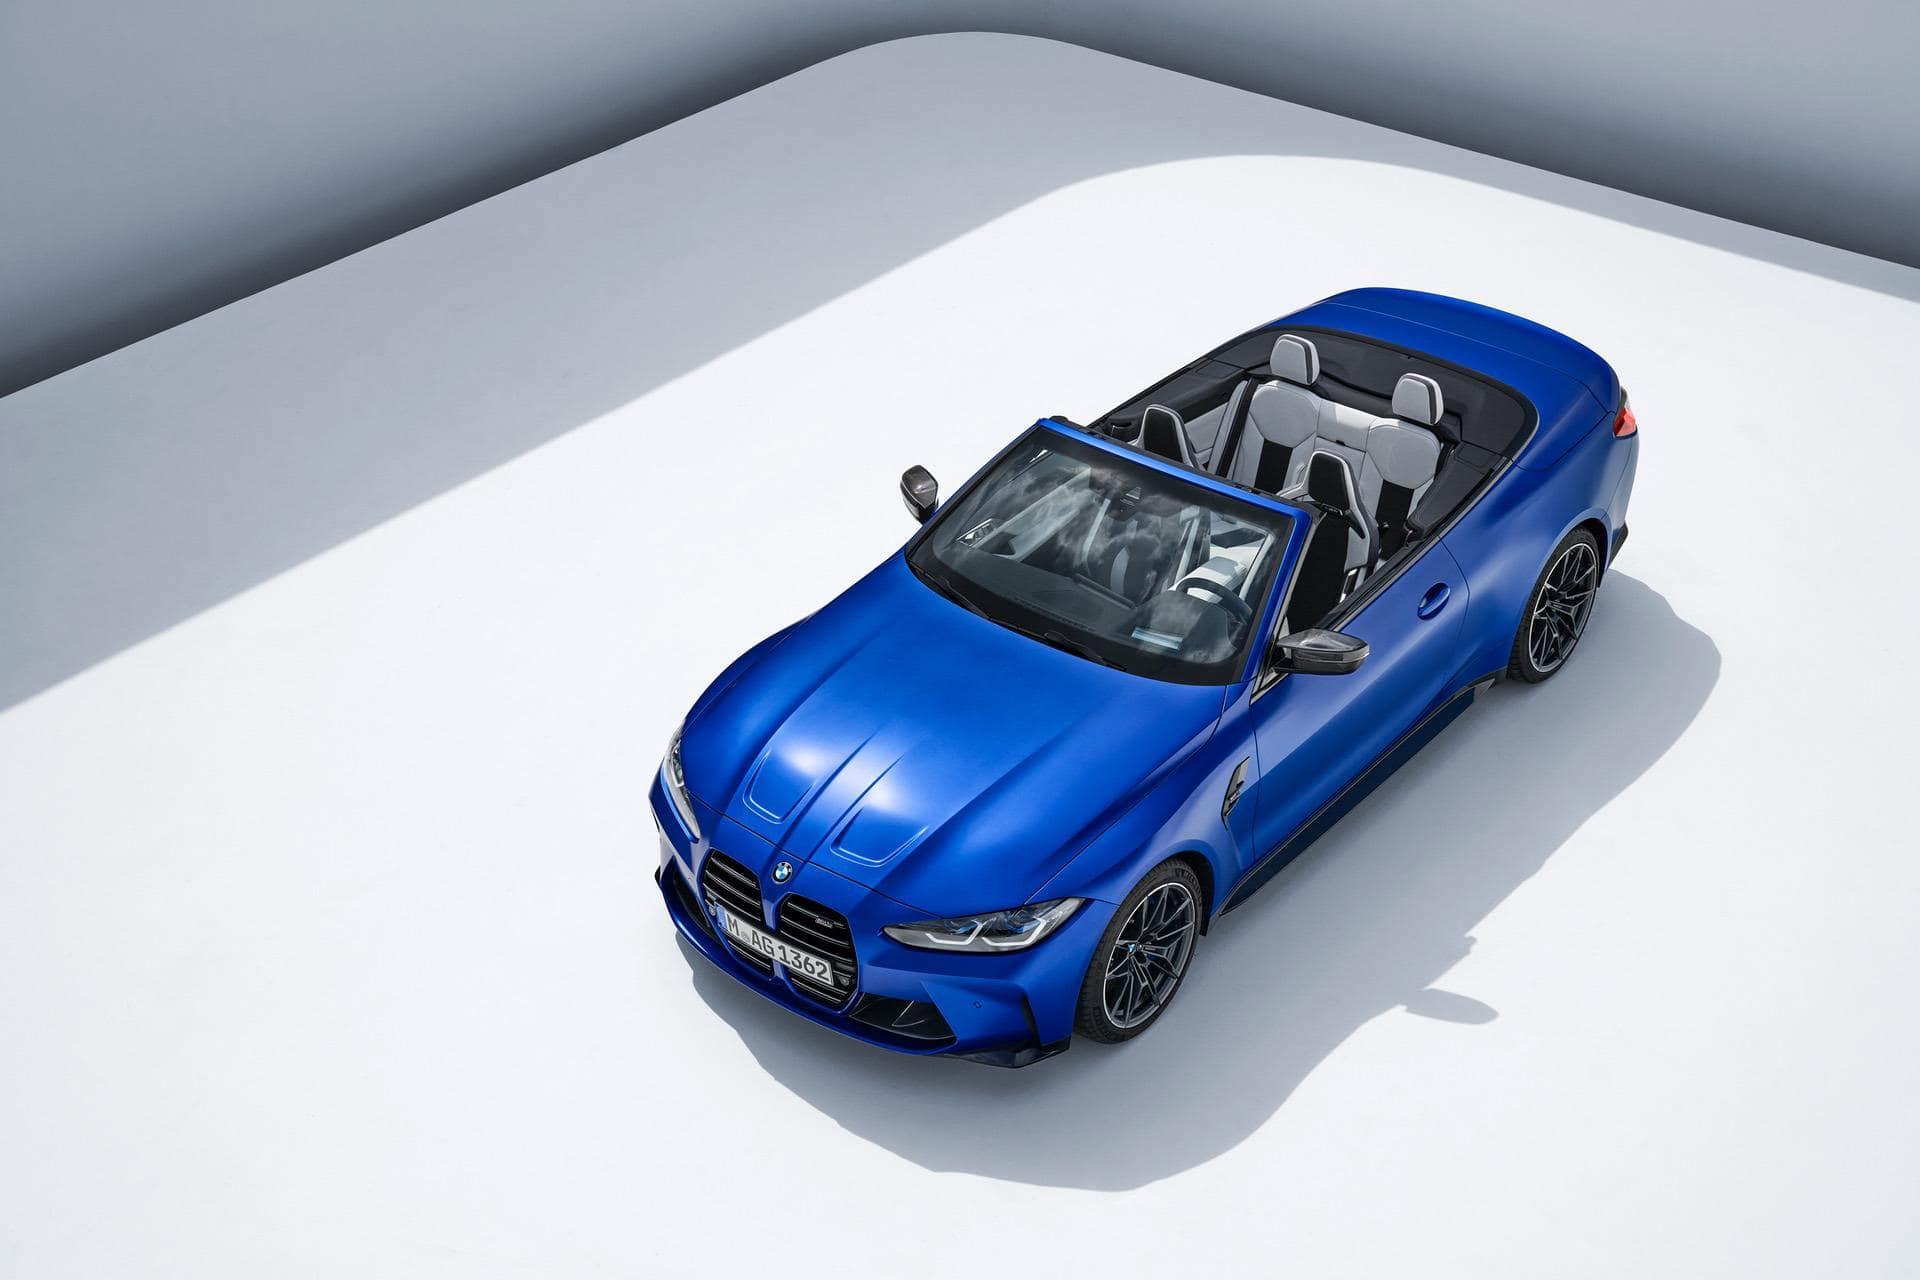 2021 bmw m4 convertible 02